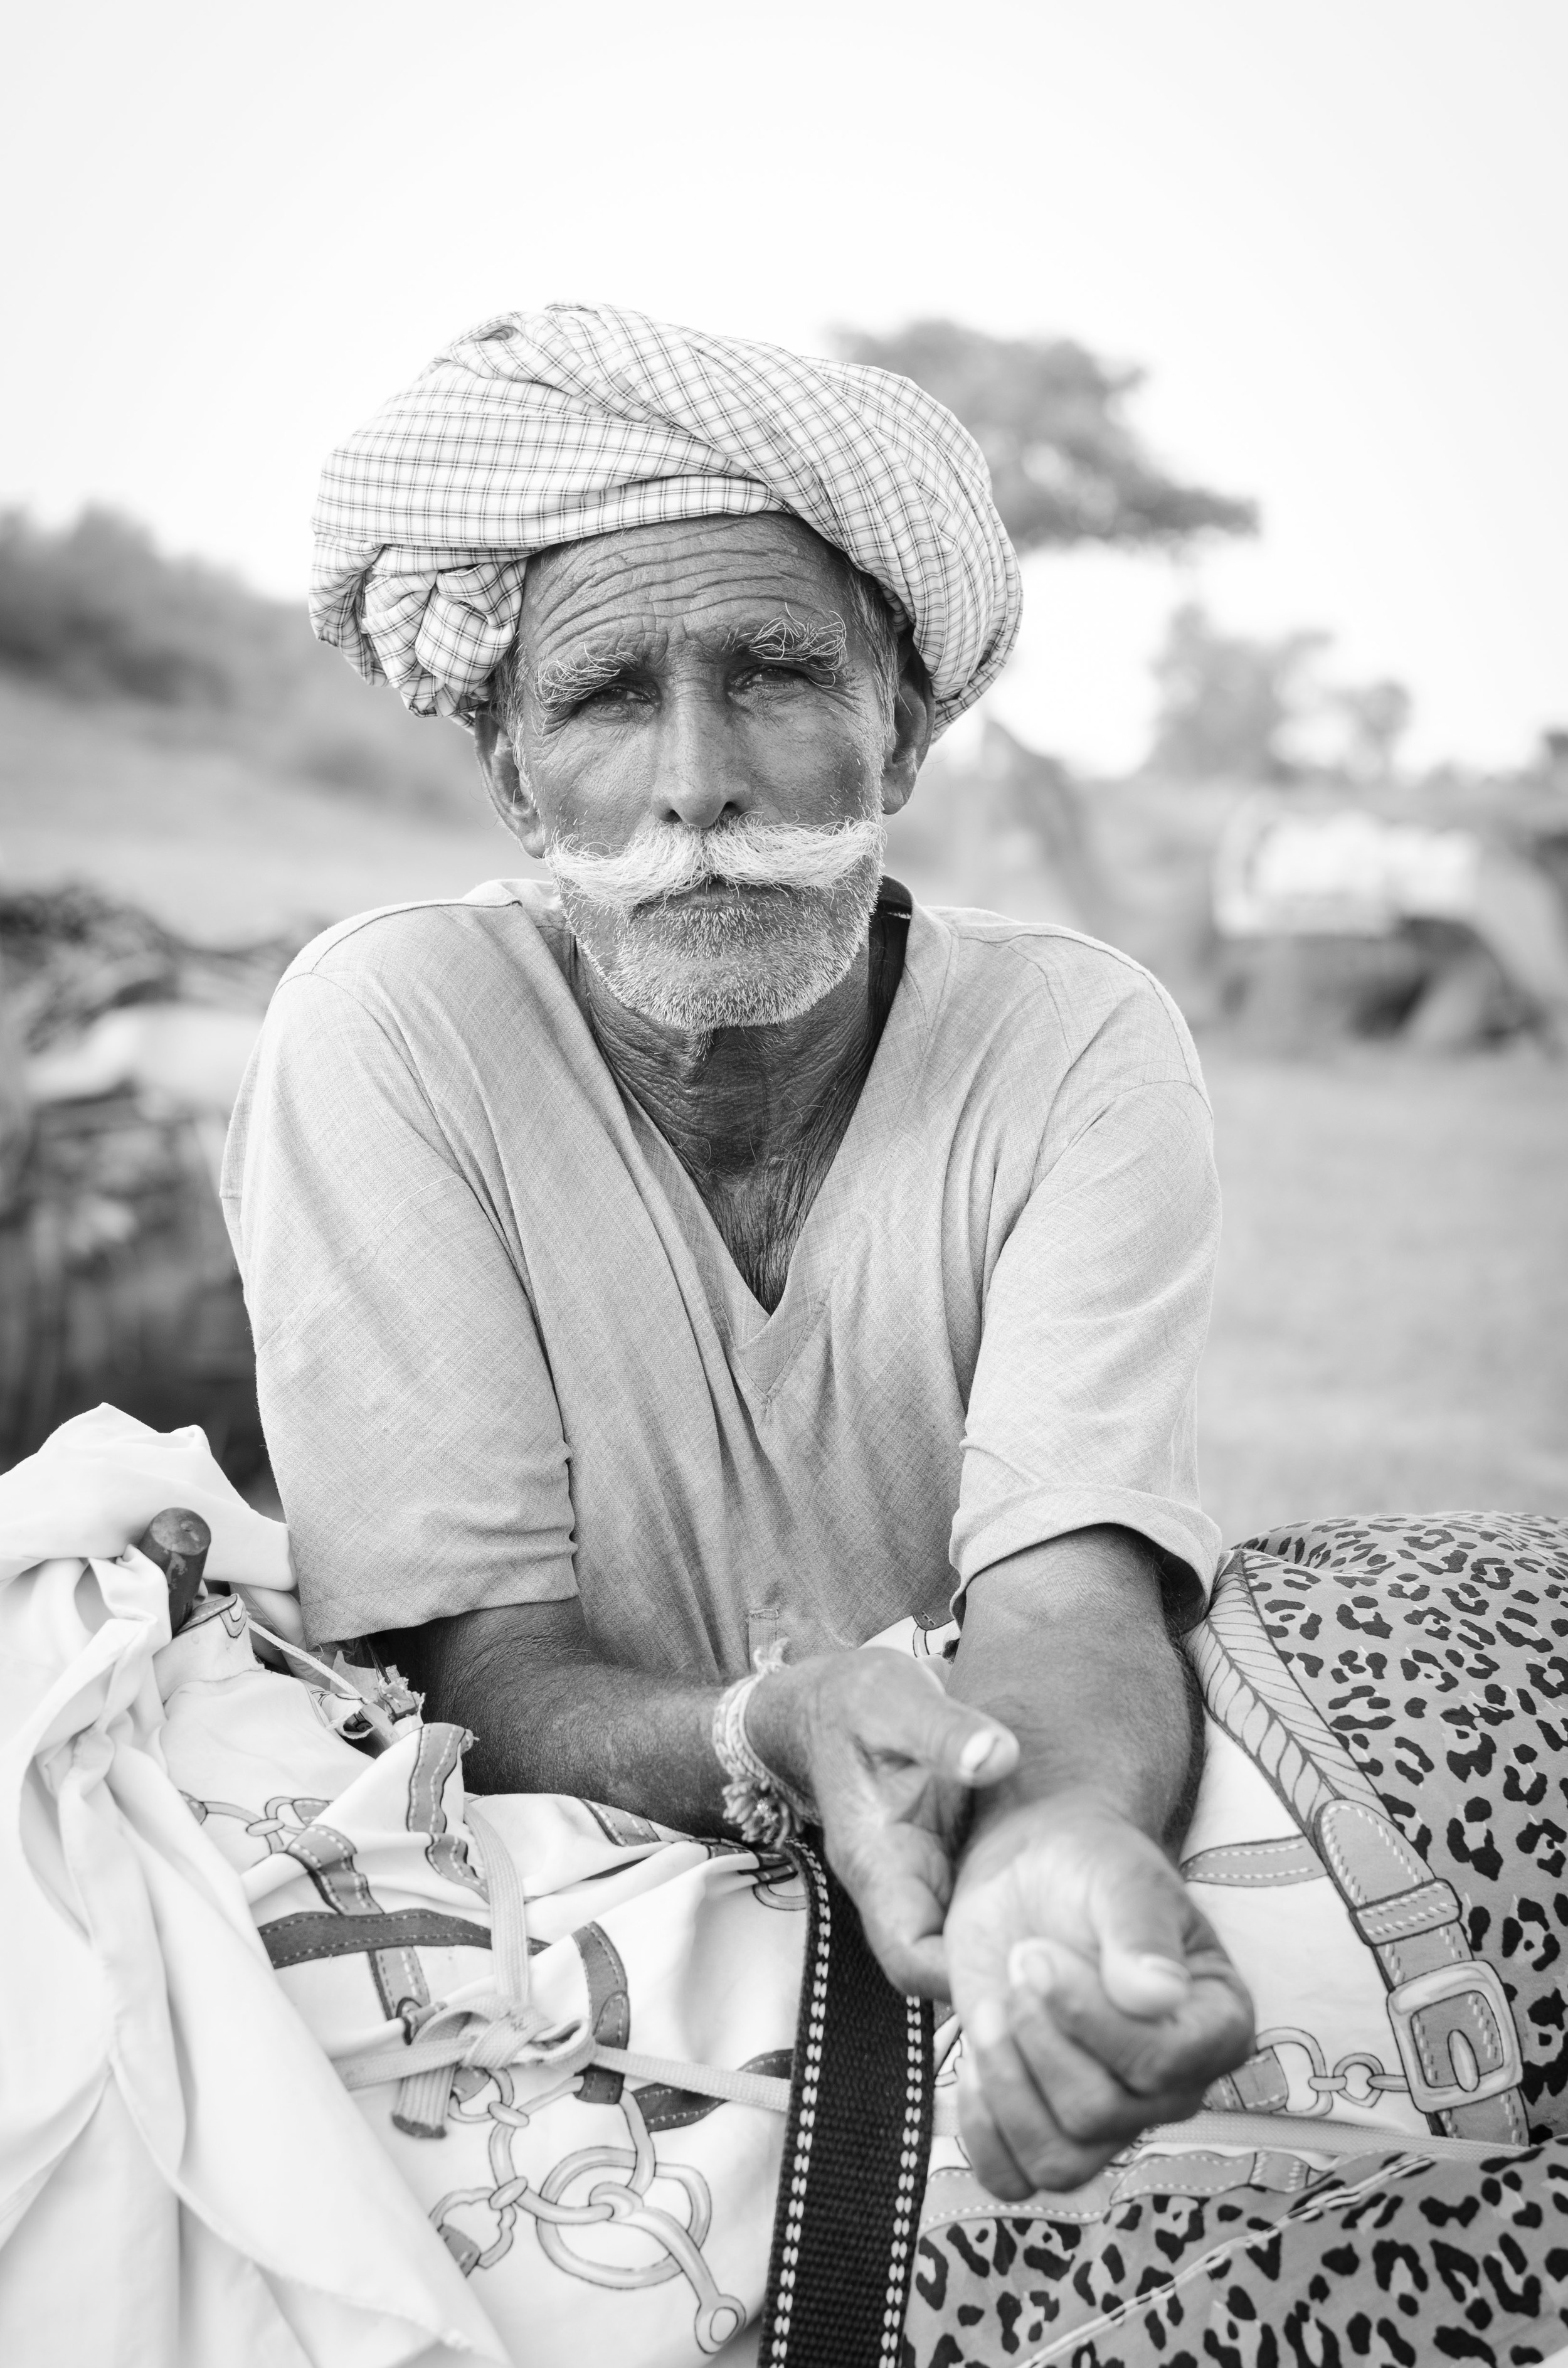 travel_photographer_india_adventure_explore-2.jpg